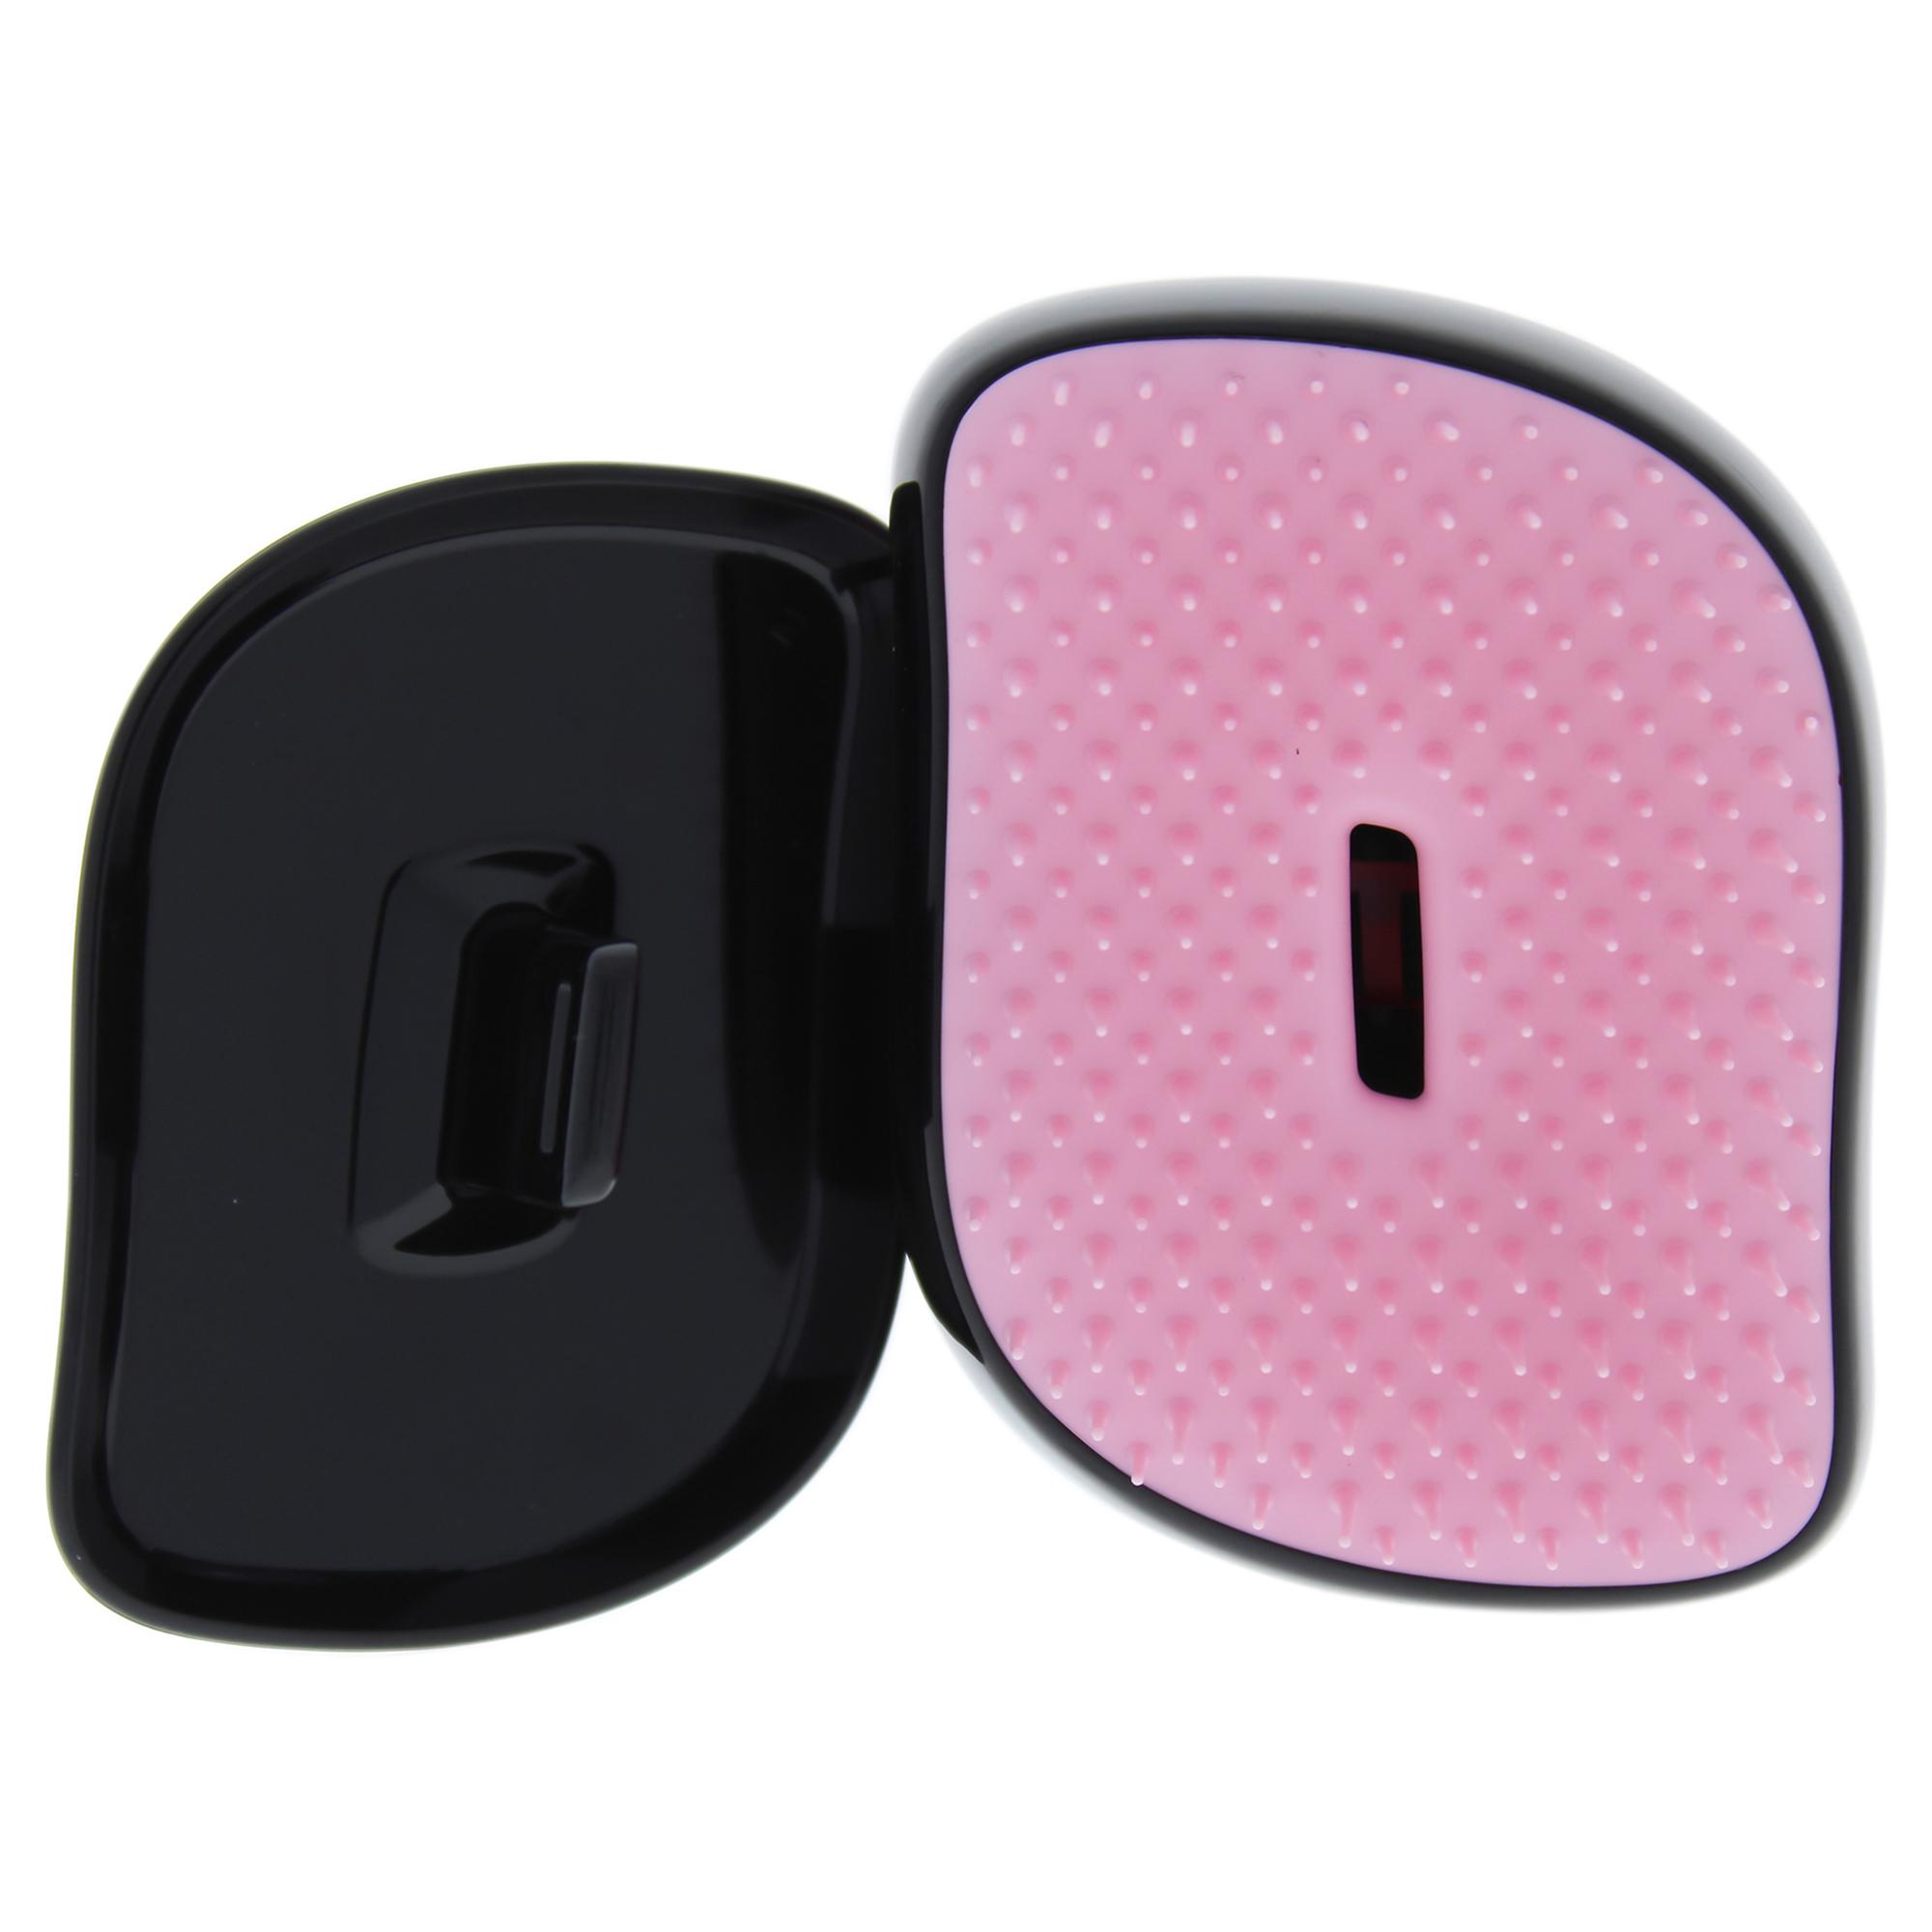 Compact Styler Detangling Hairbrush - Pink Leopard by Tangle Teezer for Women - 1 Pc Hair Brush